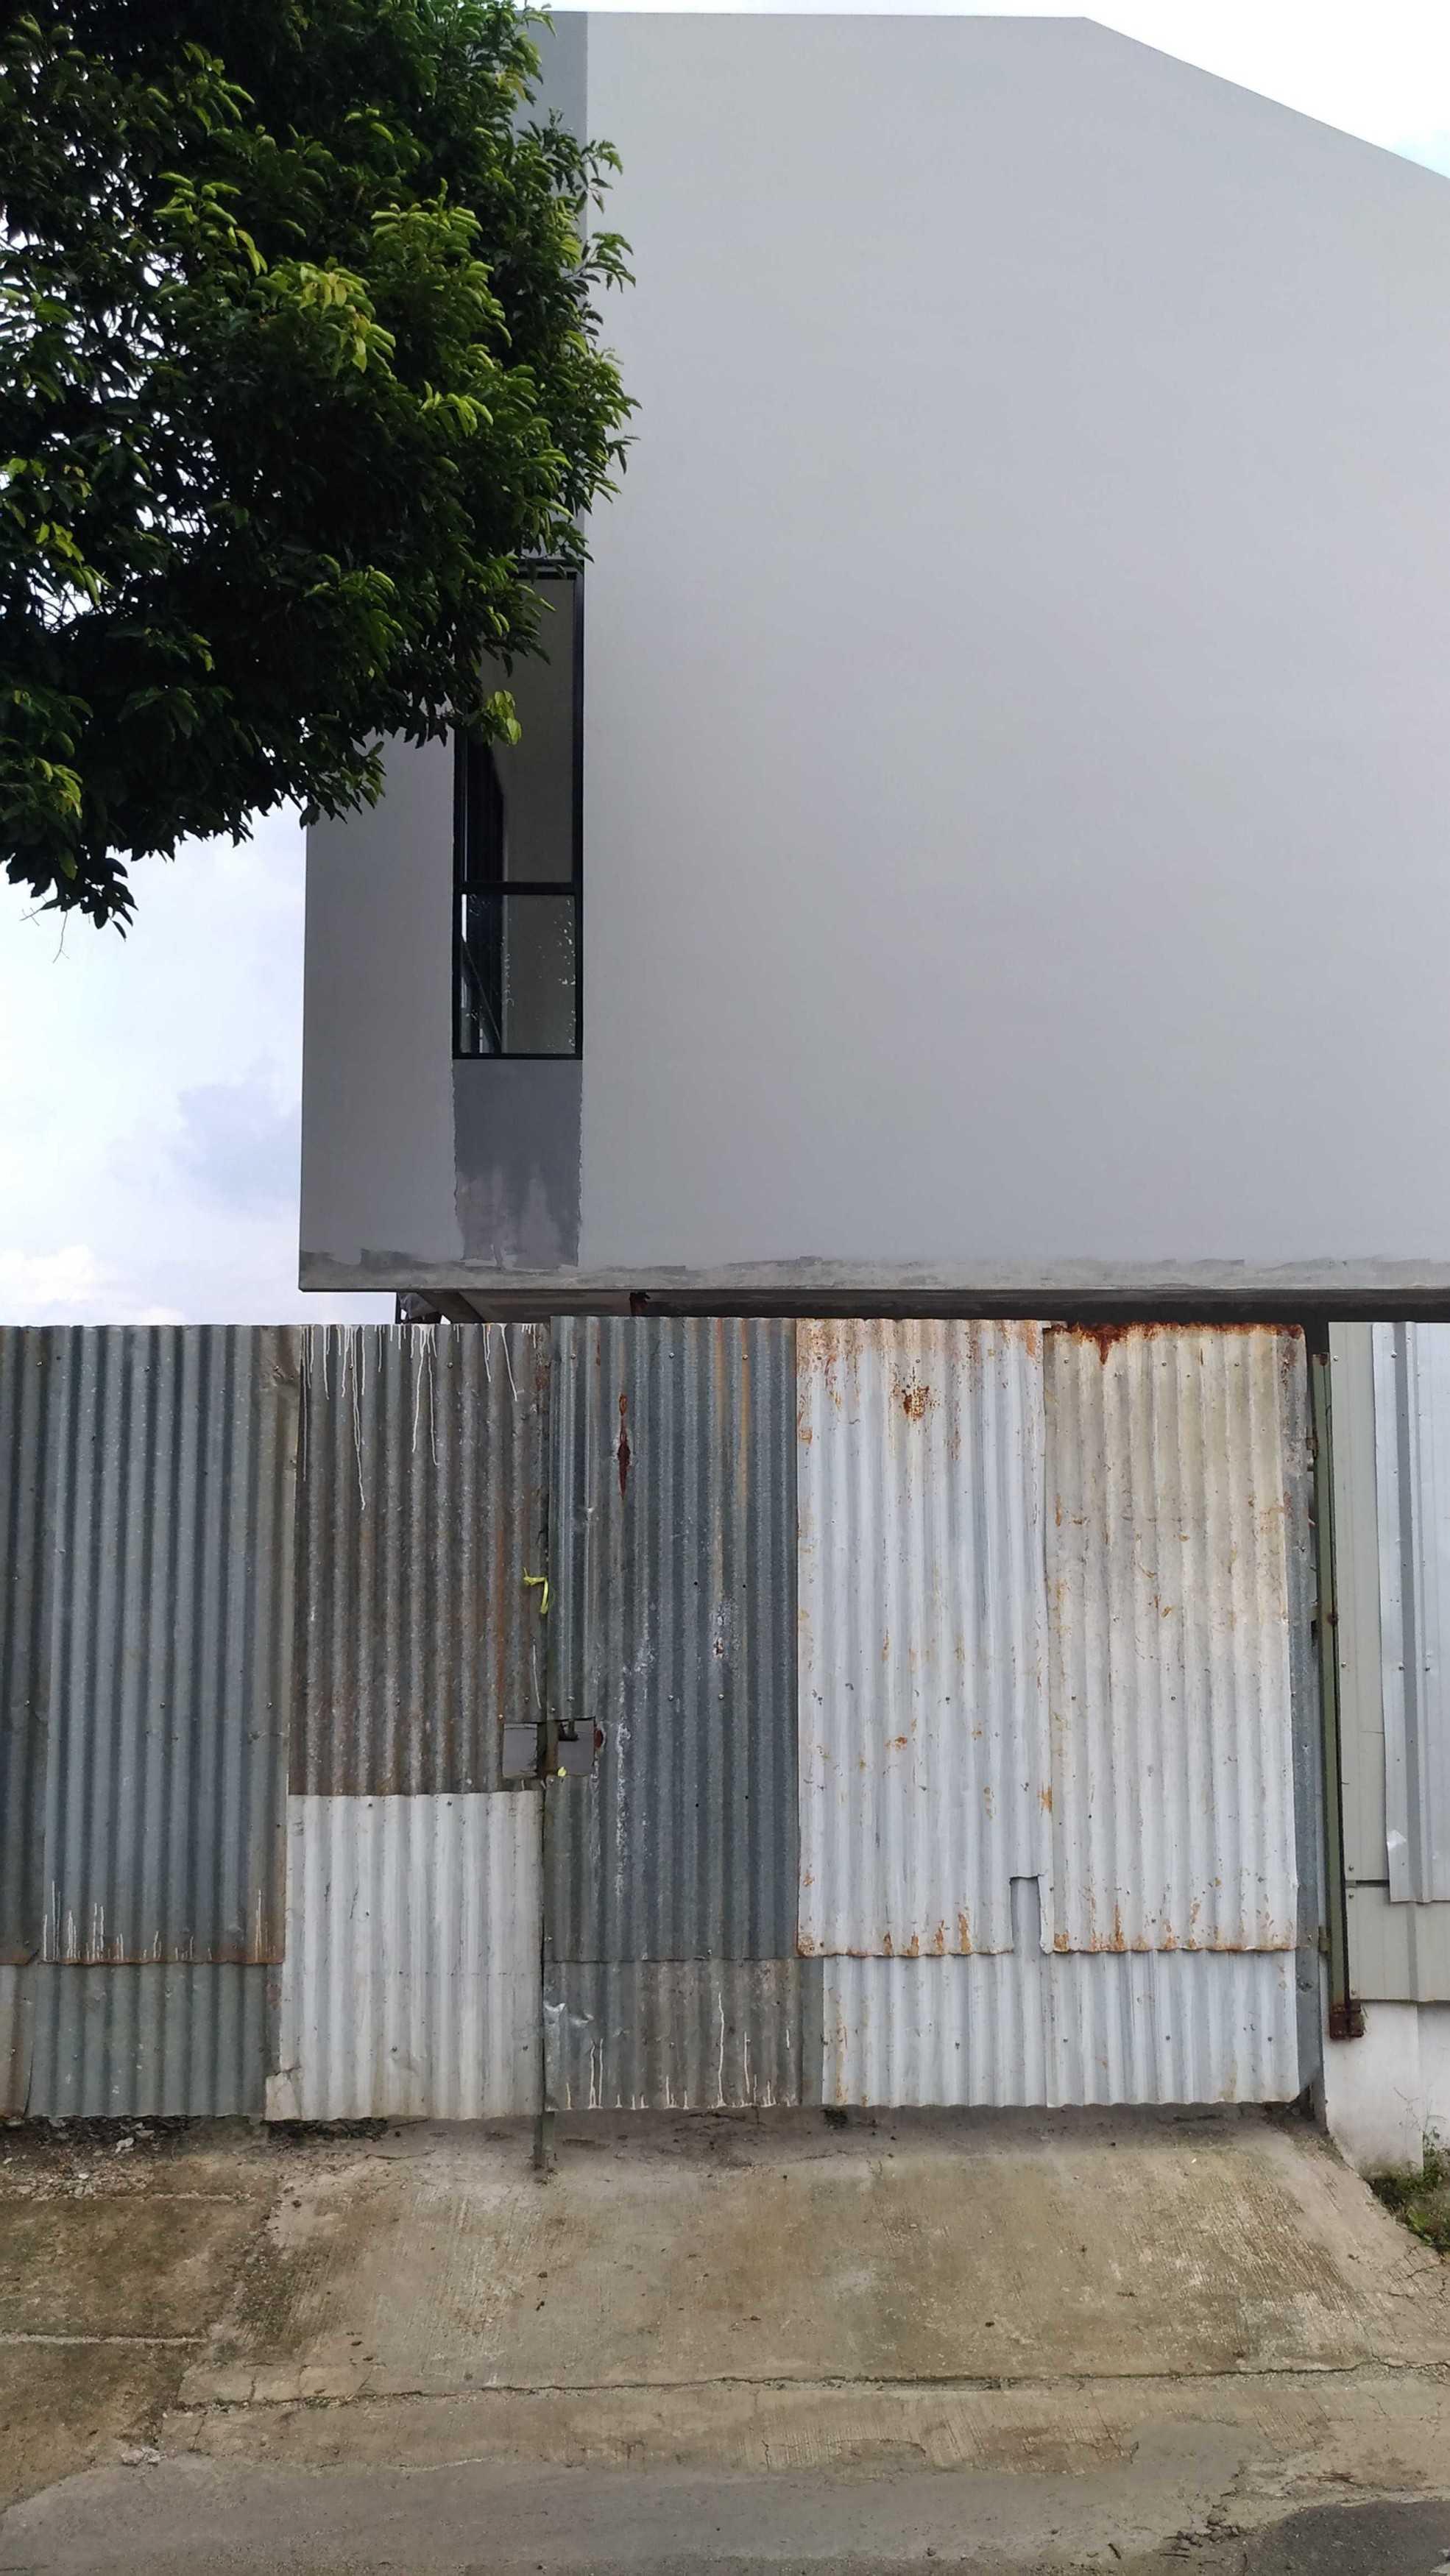 Mahastudio & Partner Renovasi Rumah Beiji Depok City, West Java, Indonesia Depok City, West Java, Indonesia Under Construction Tropis  51338